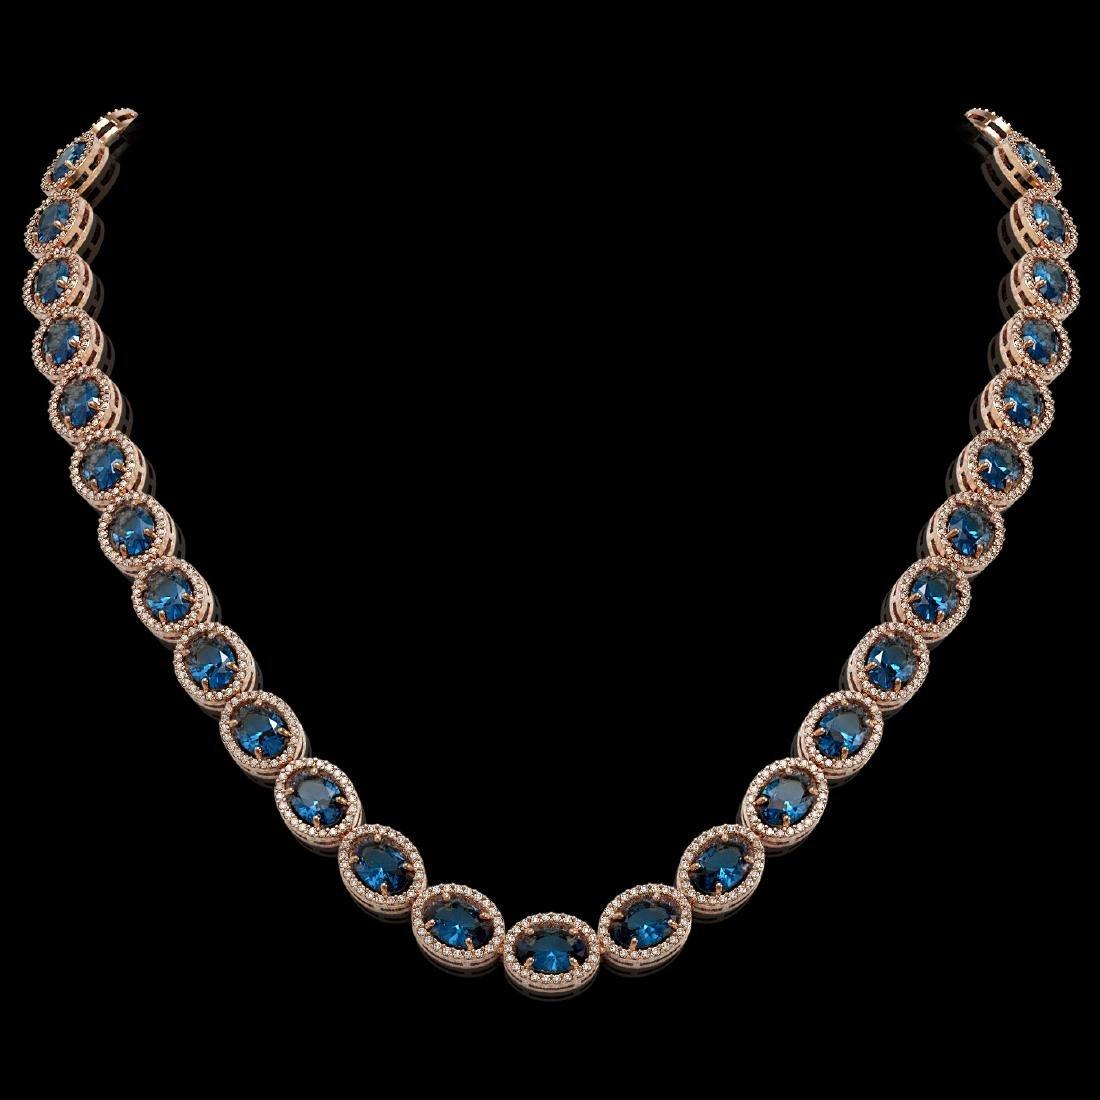 55.41 CTW London Topaz & Diamond Halo Necklace 10K Rose